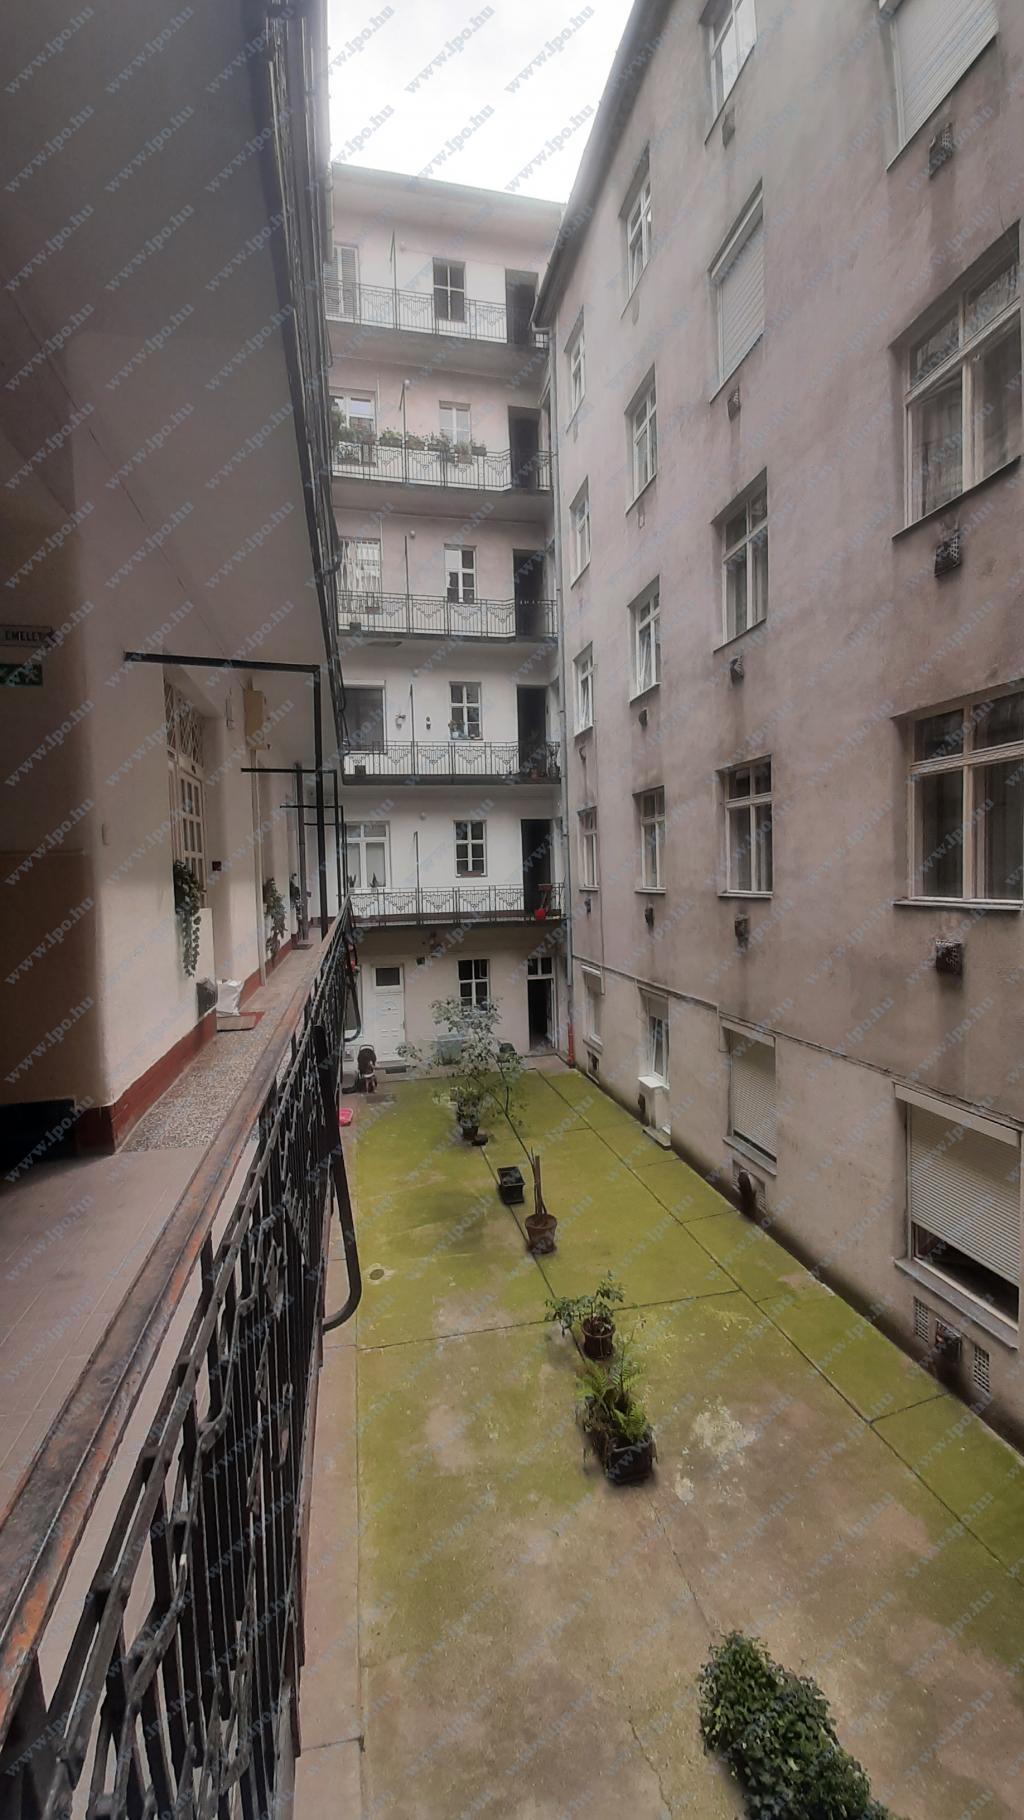 flat For sale 1133 Budapest Hegedűs Gyula utca 106sqm 99M HUF Property image: 1